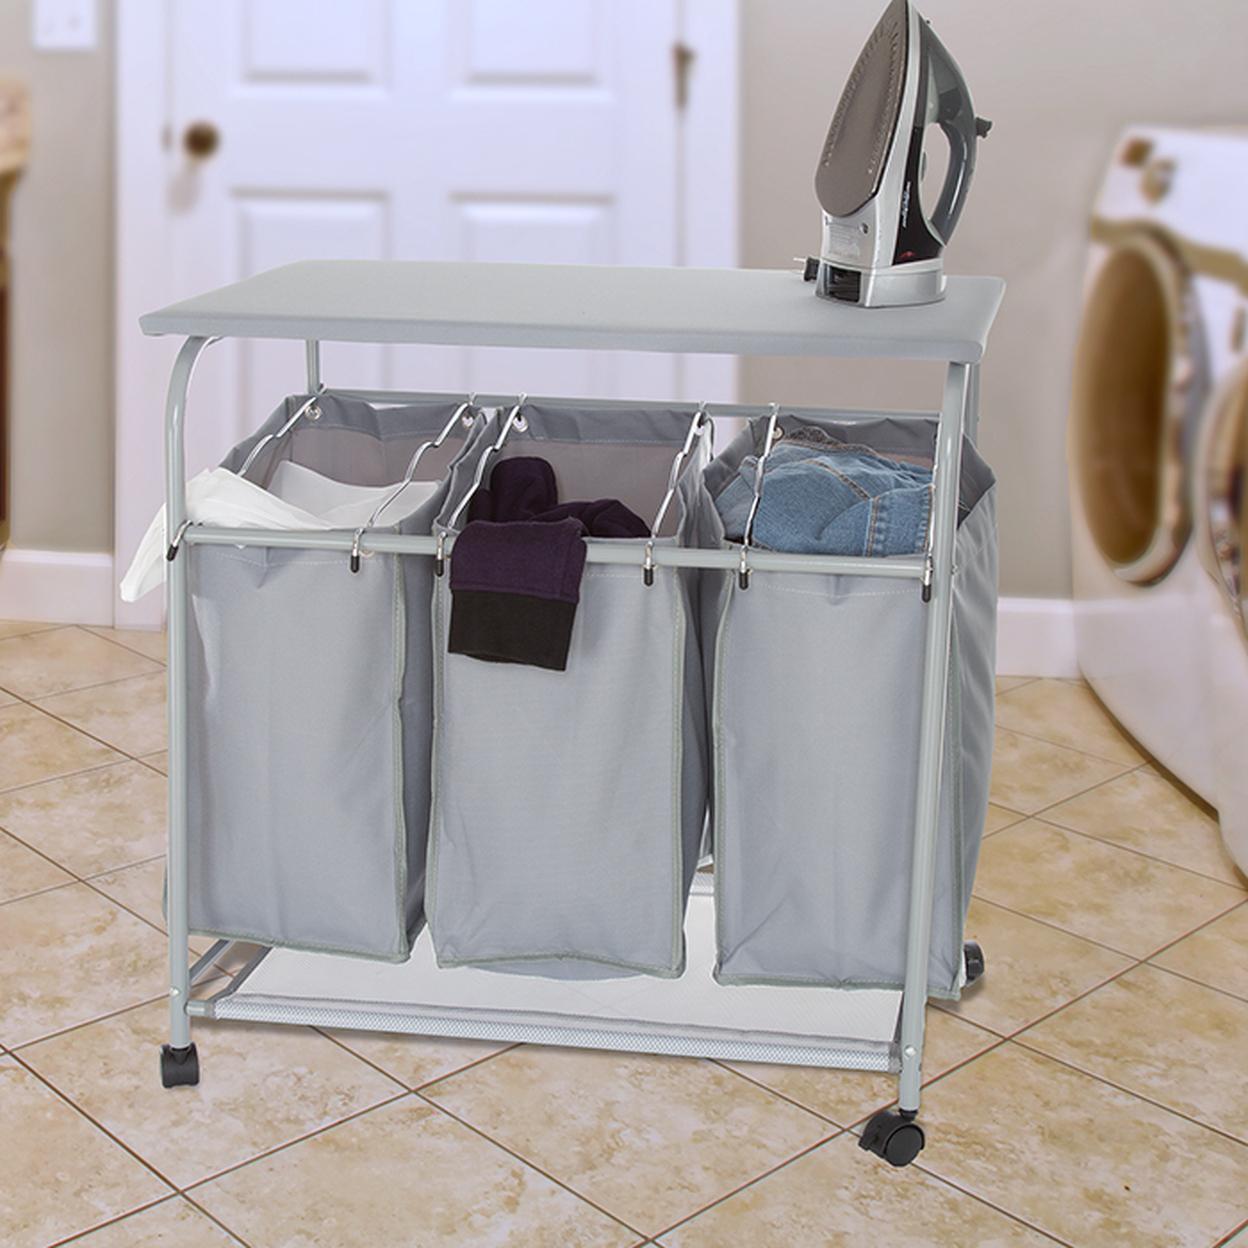 Lavish Home Rolling 3 Bin Laundry Sorter And Ironing Station Gray